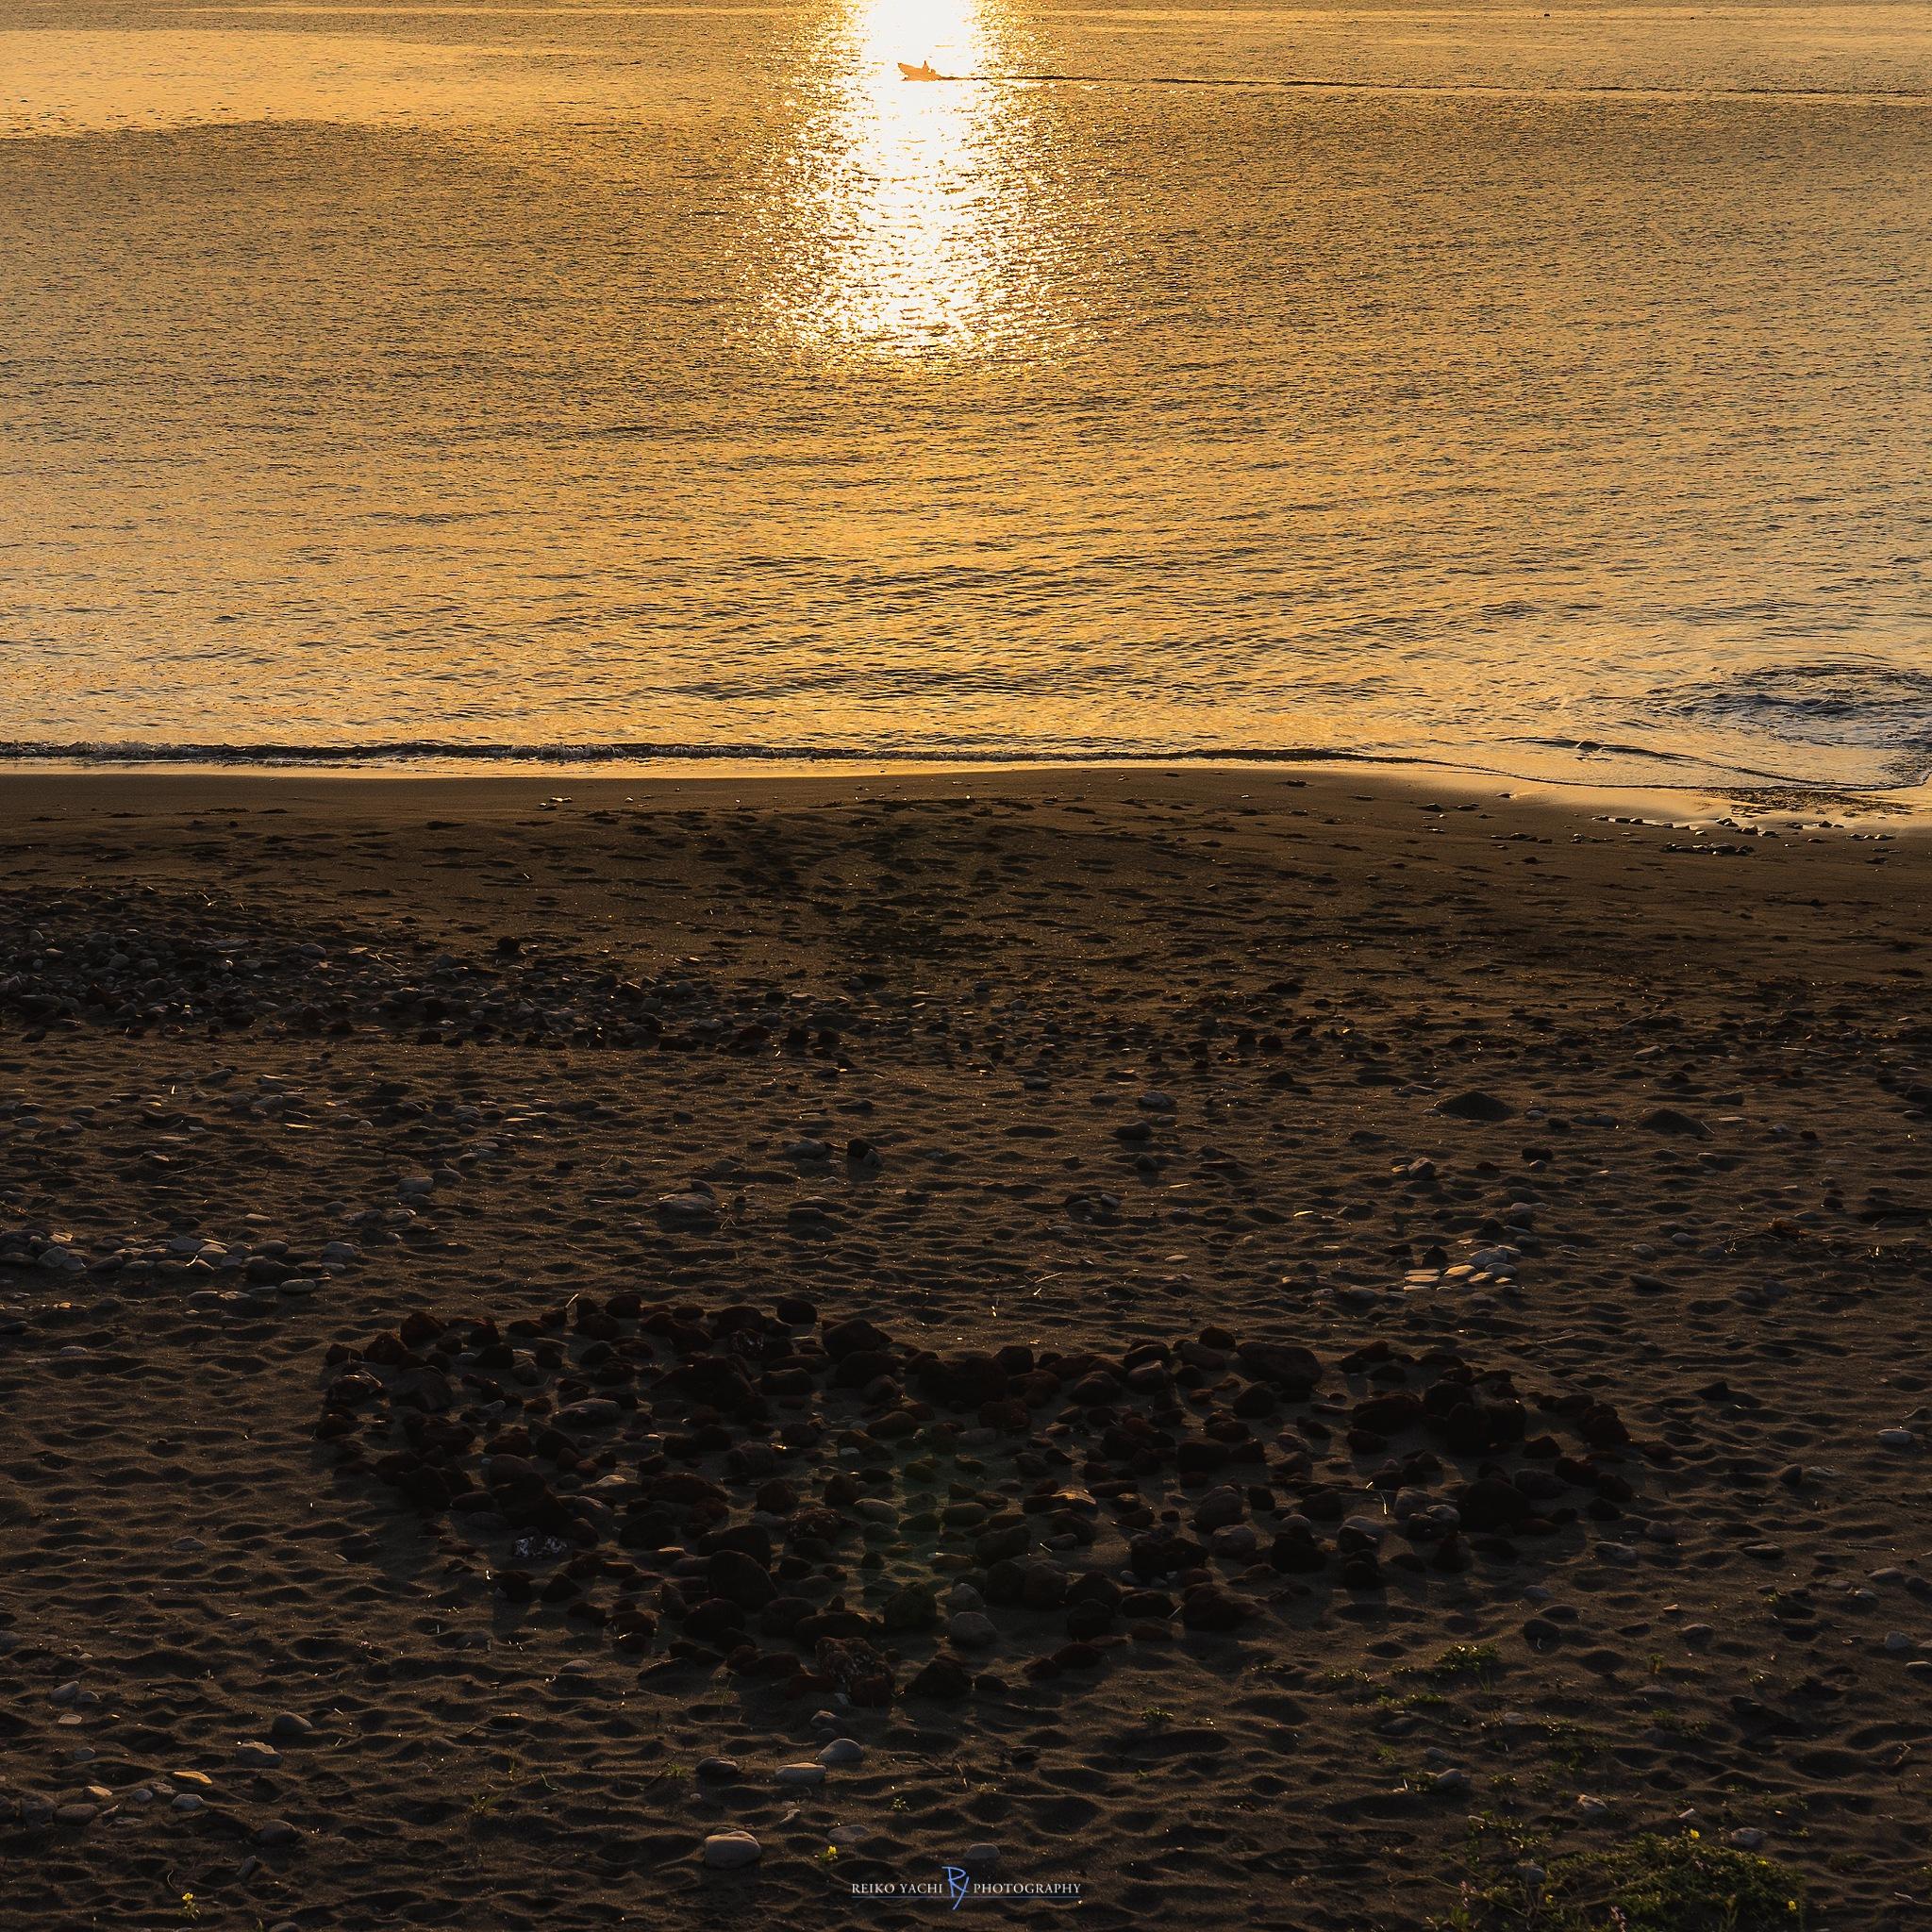 Heart on the beach by Reiko Yachi